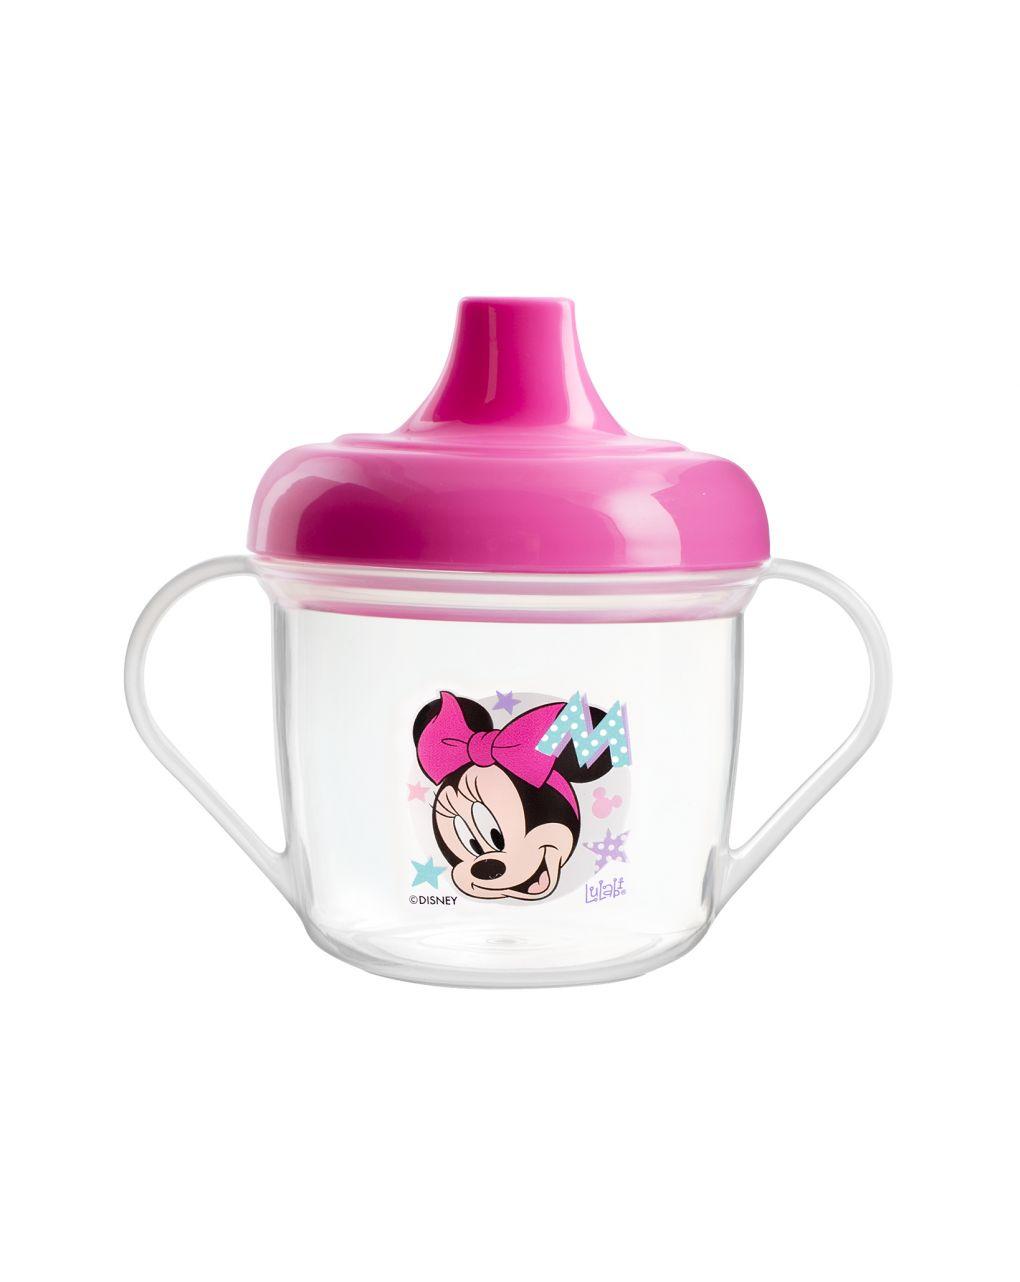 Tazza minniesimply sorsi - Lulabi Disney